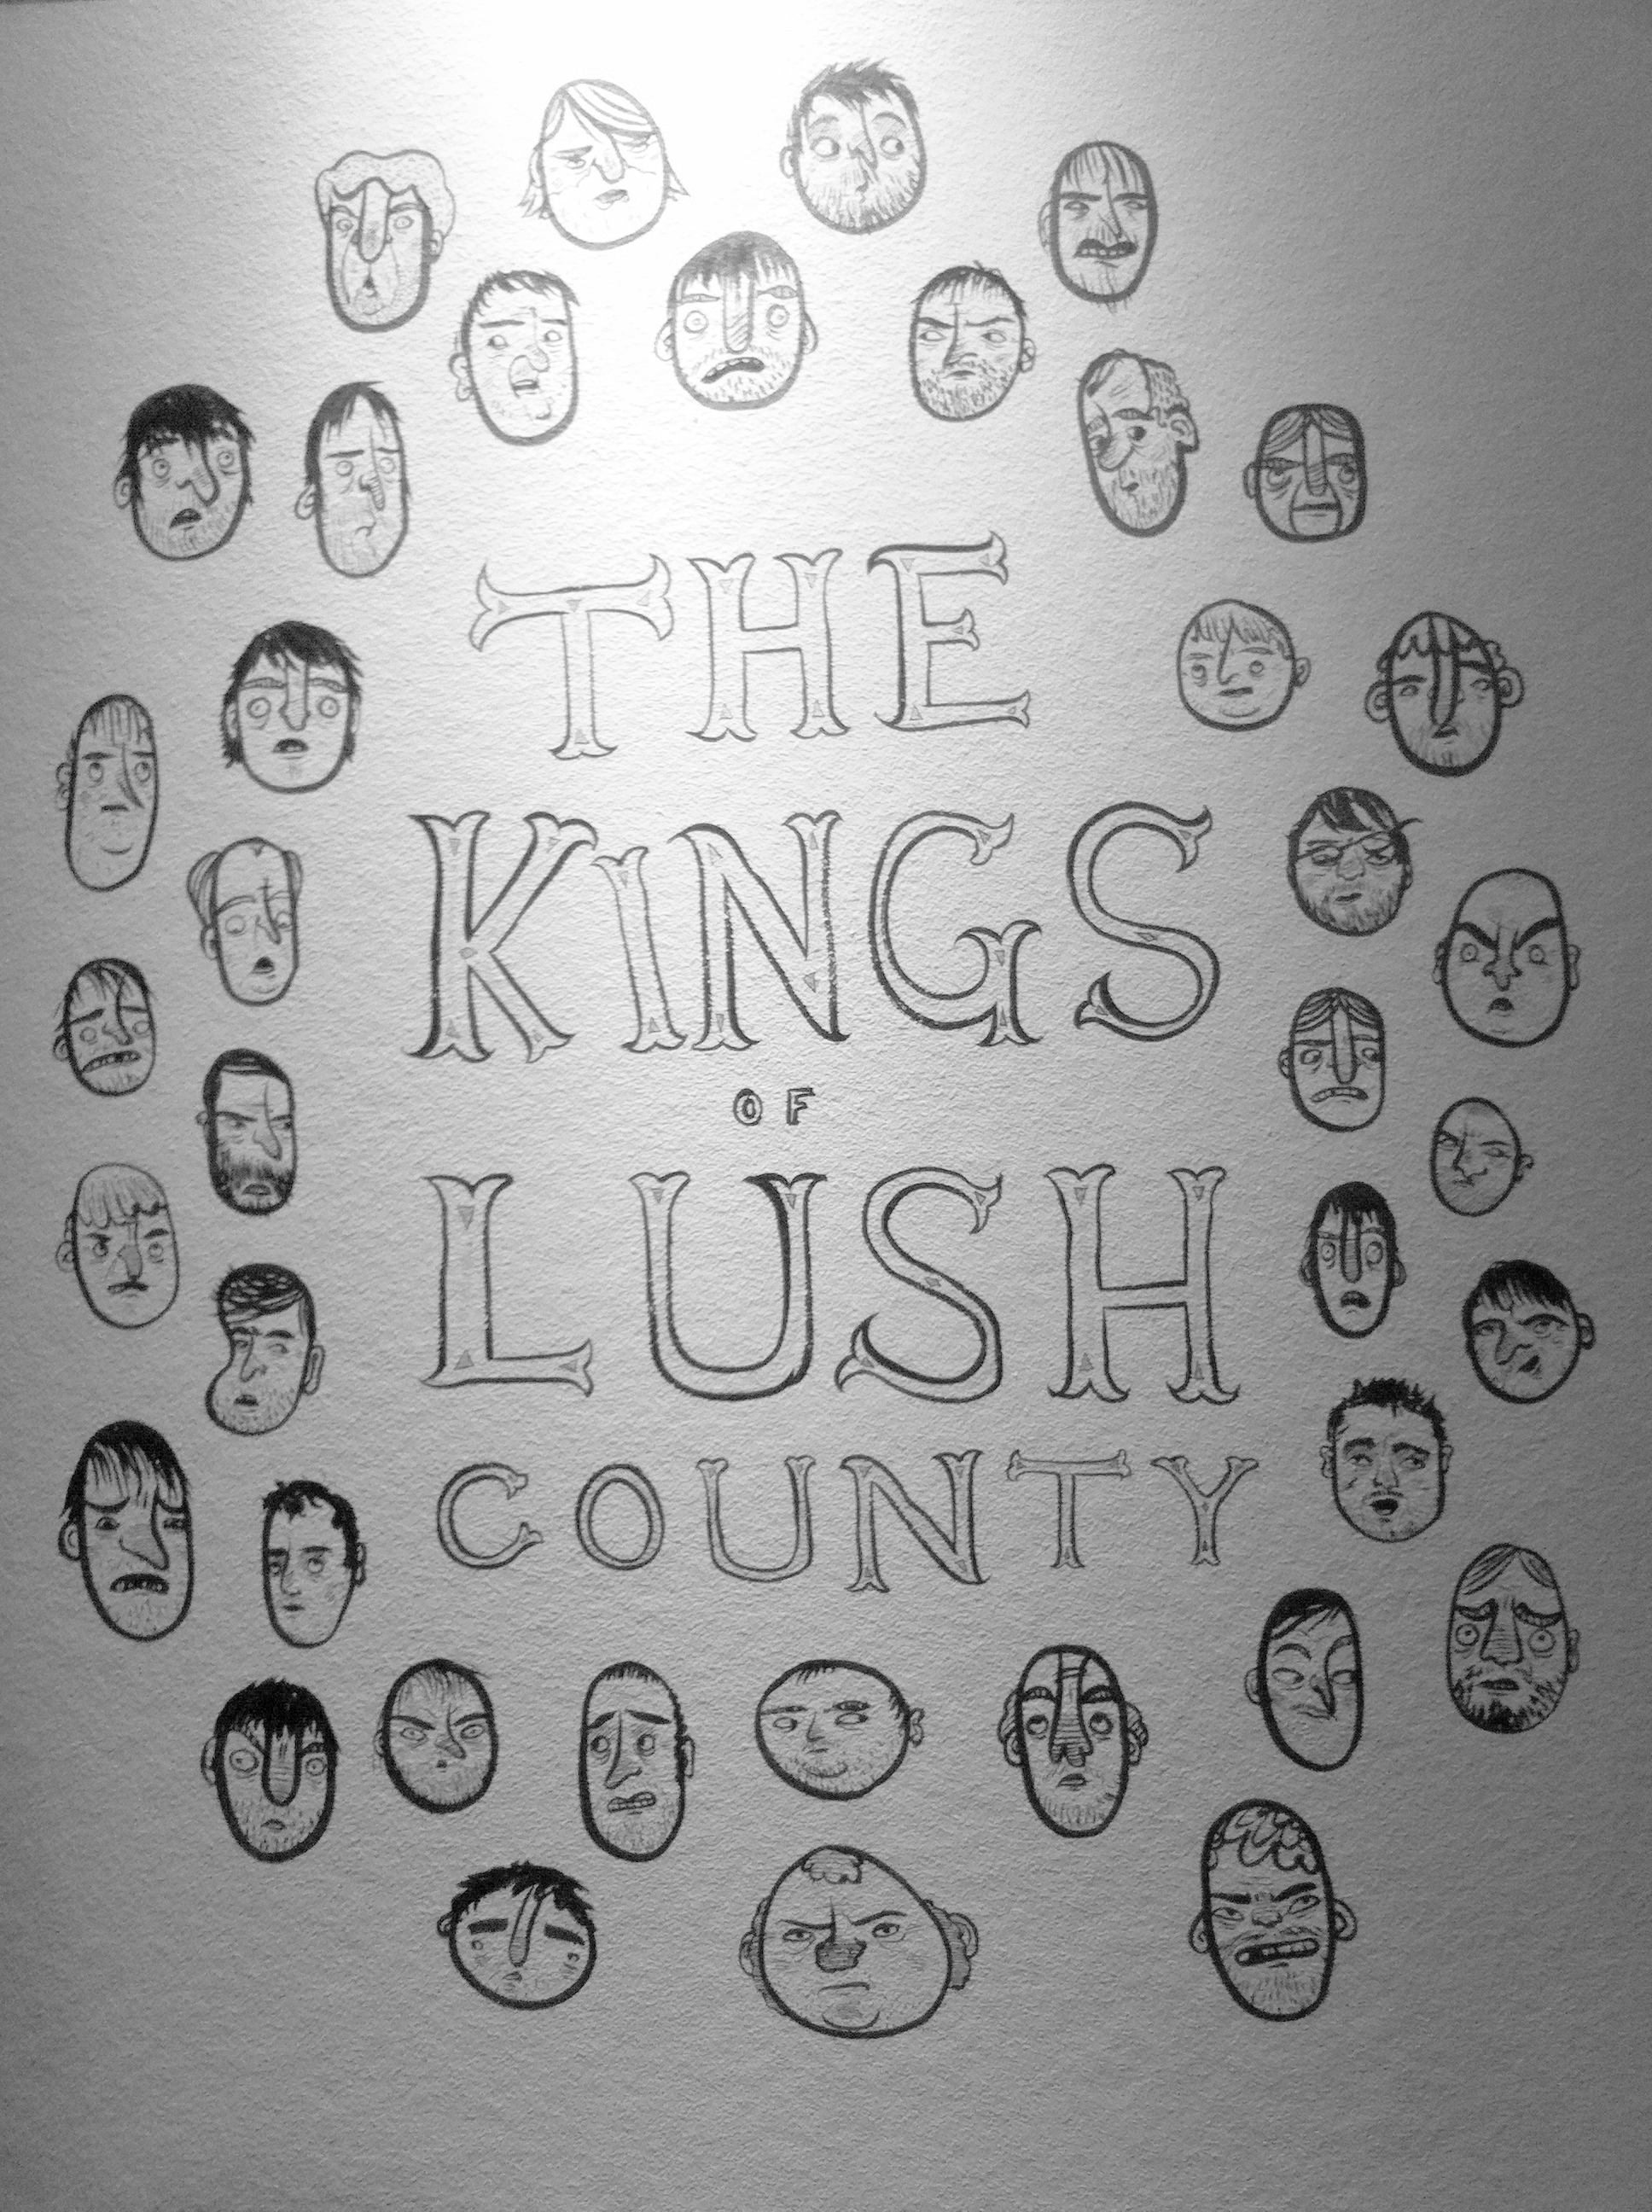 Lush-County